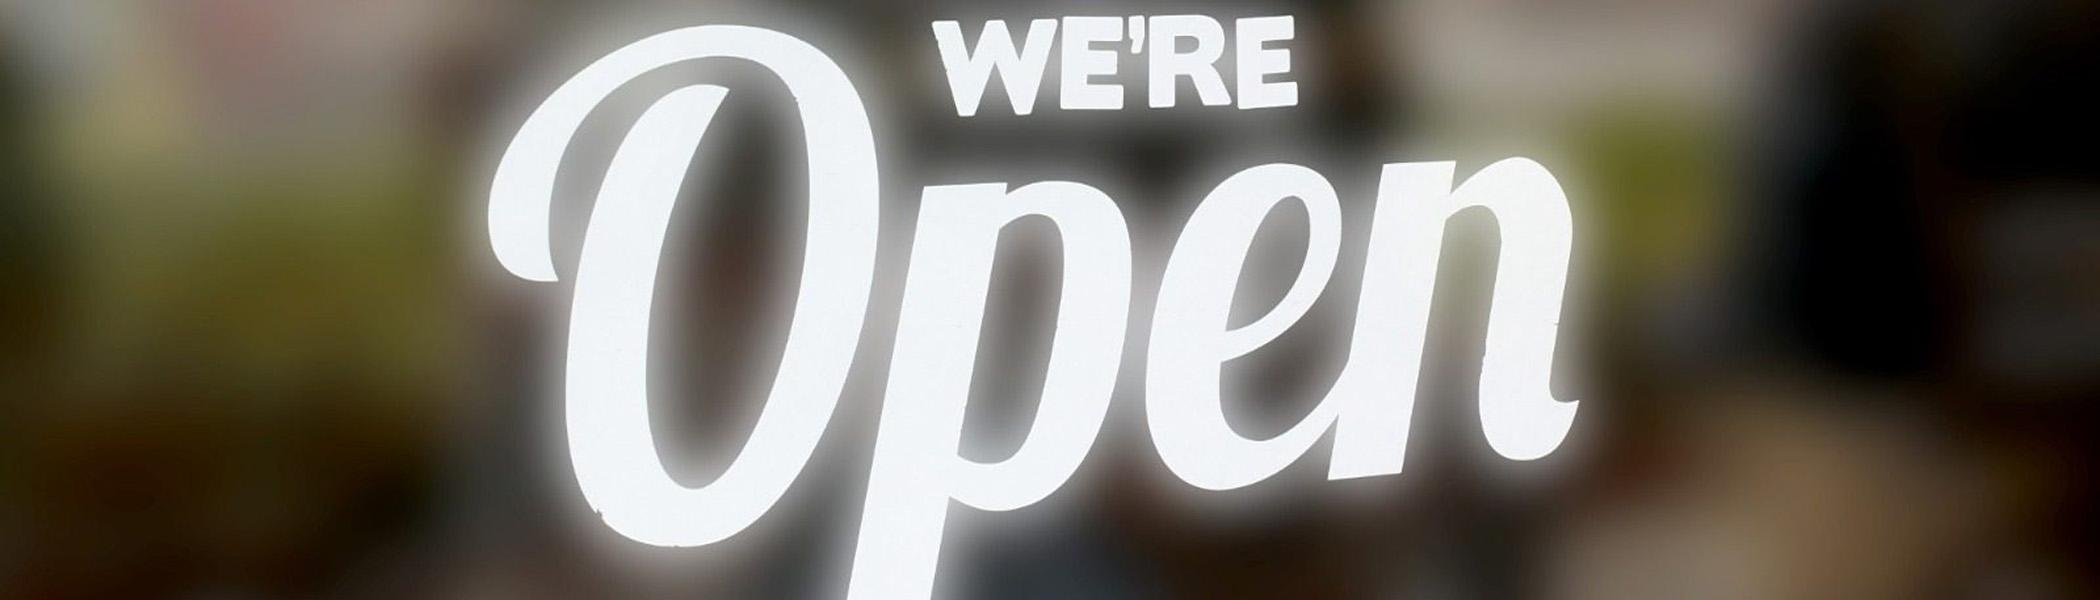 Bishopbriggs We're Open